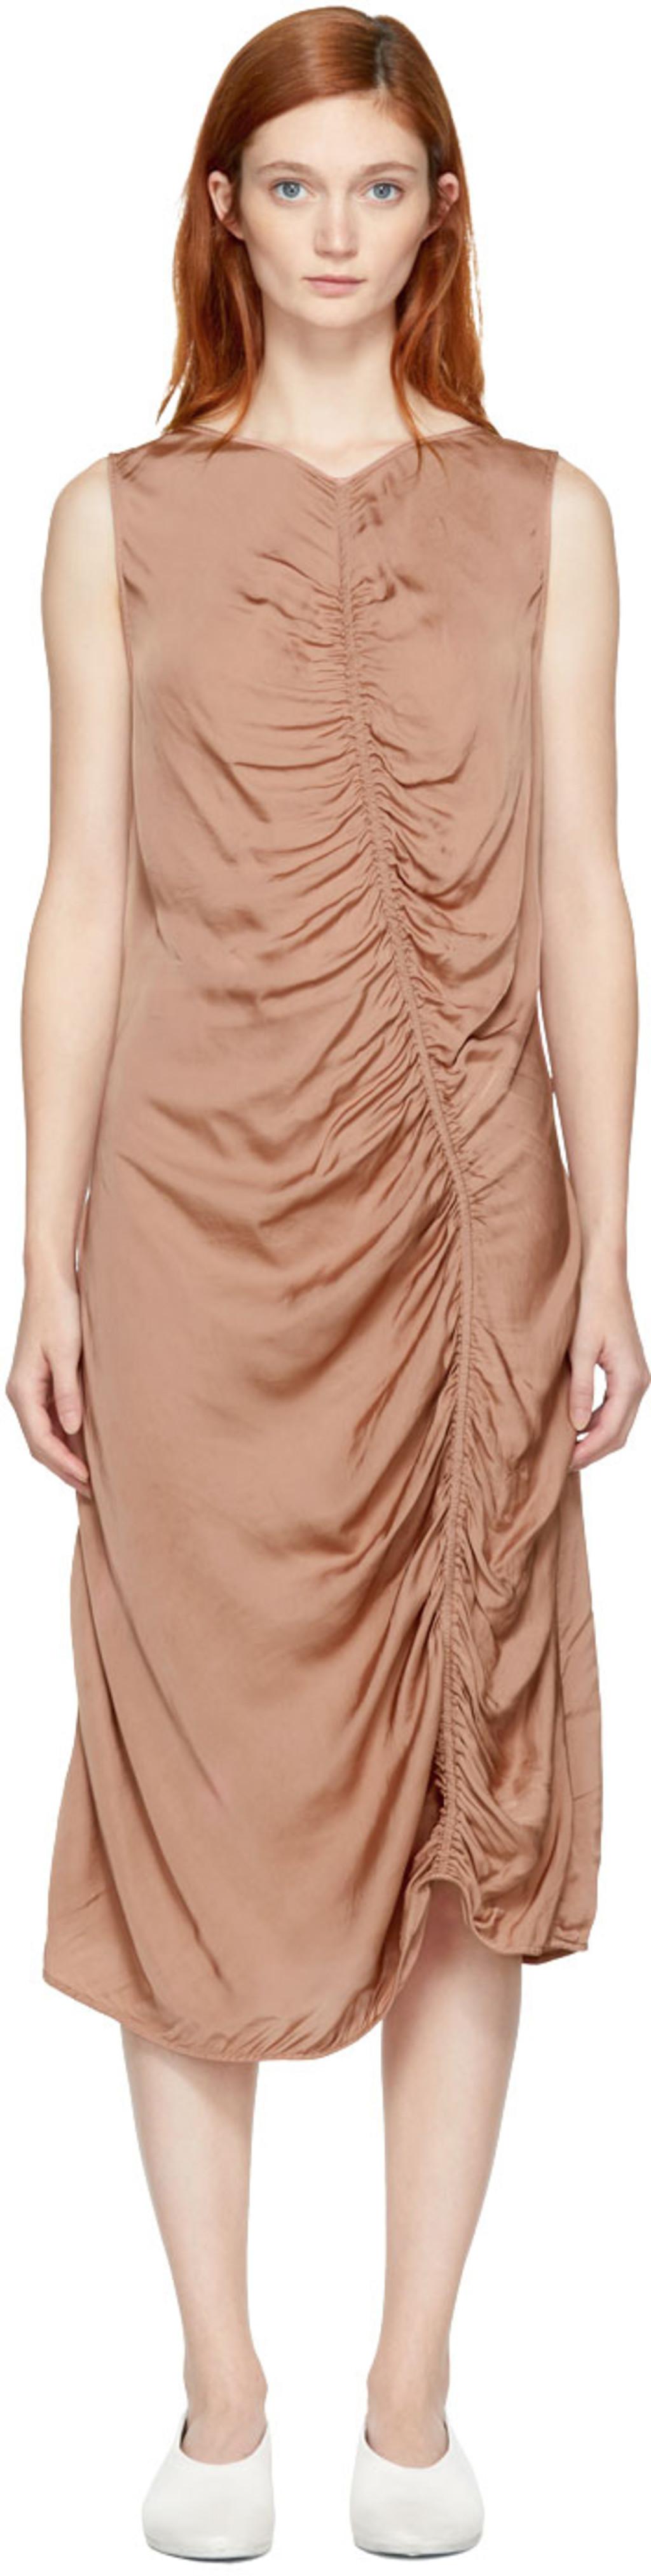 Pink Liquid Satin Dress Raquel Allegra